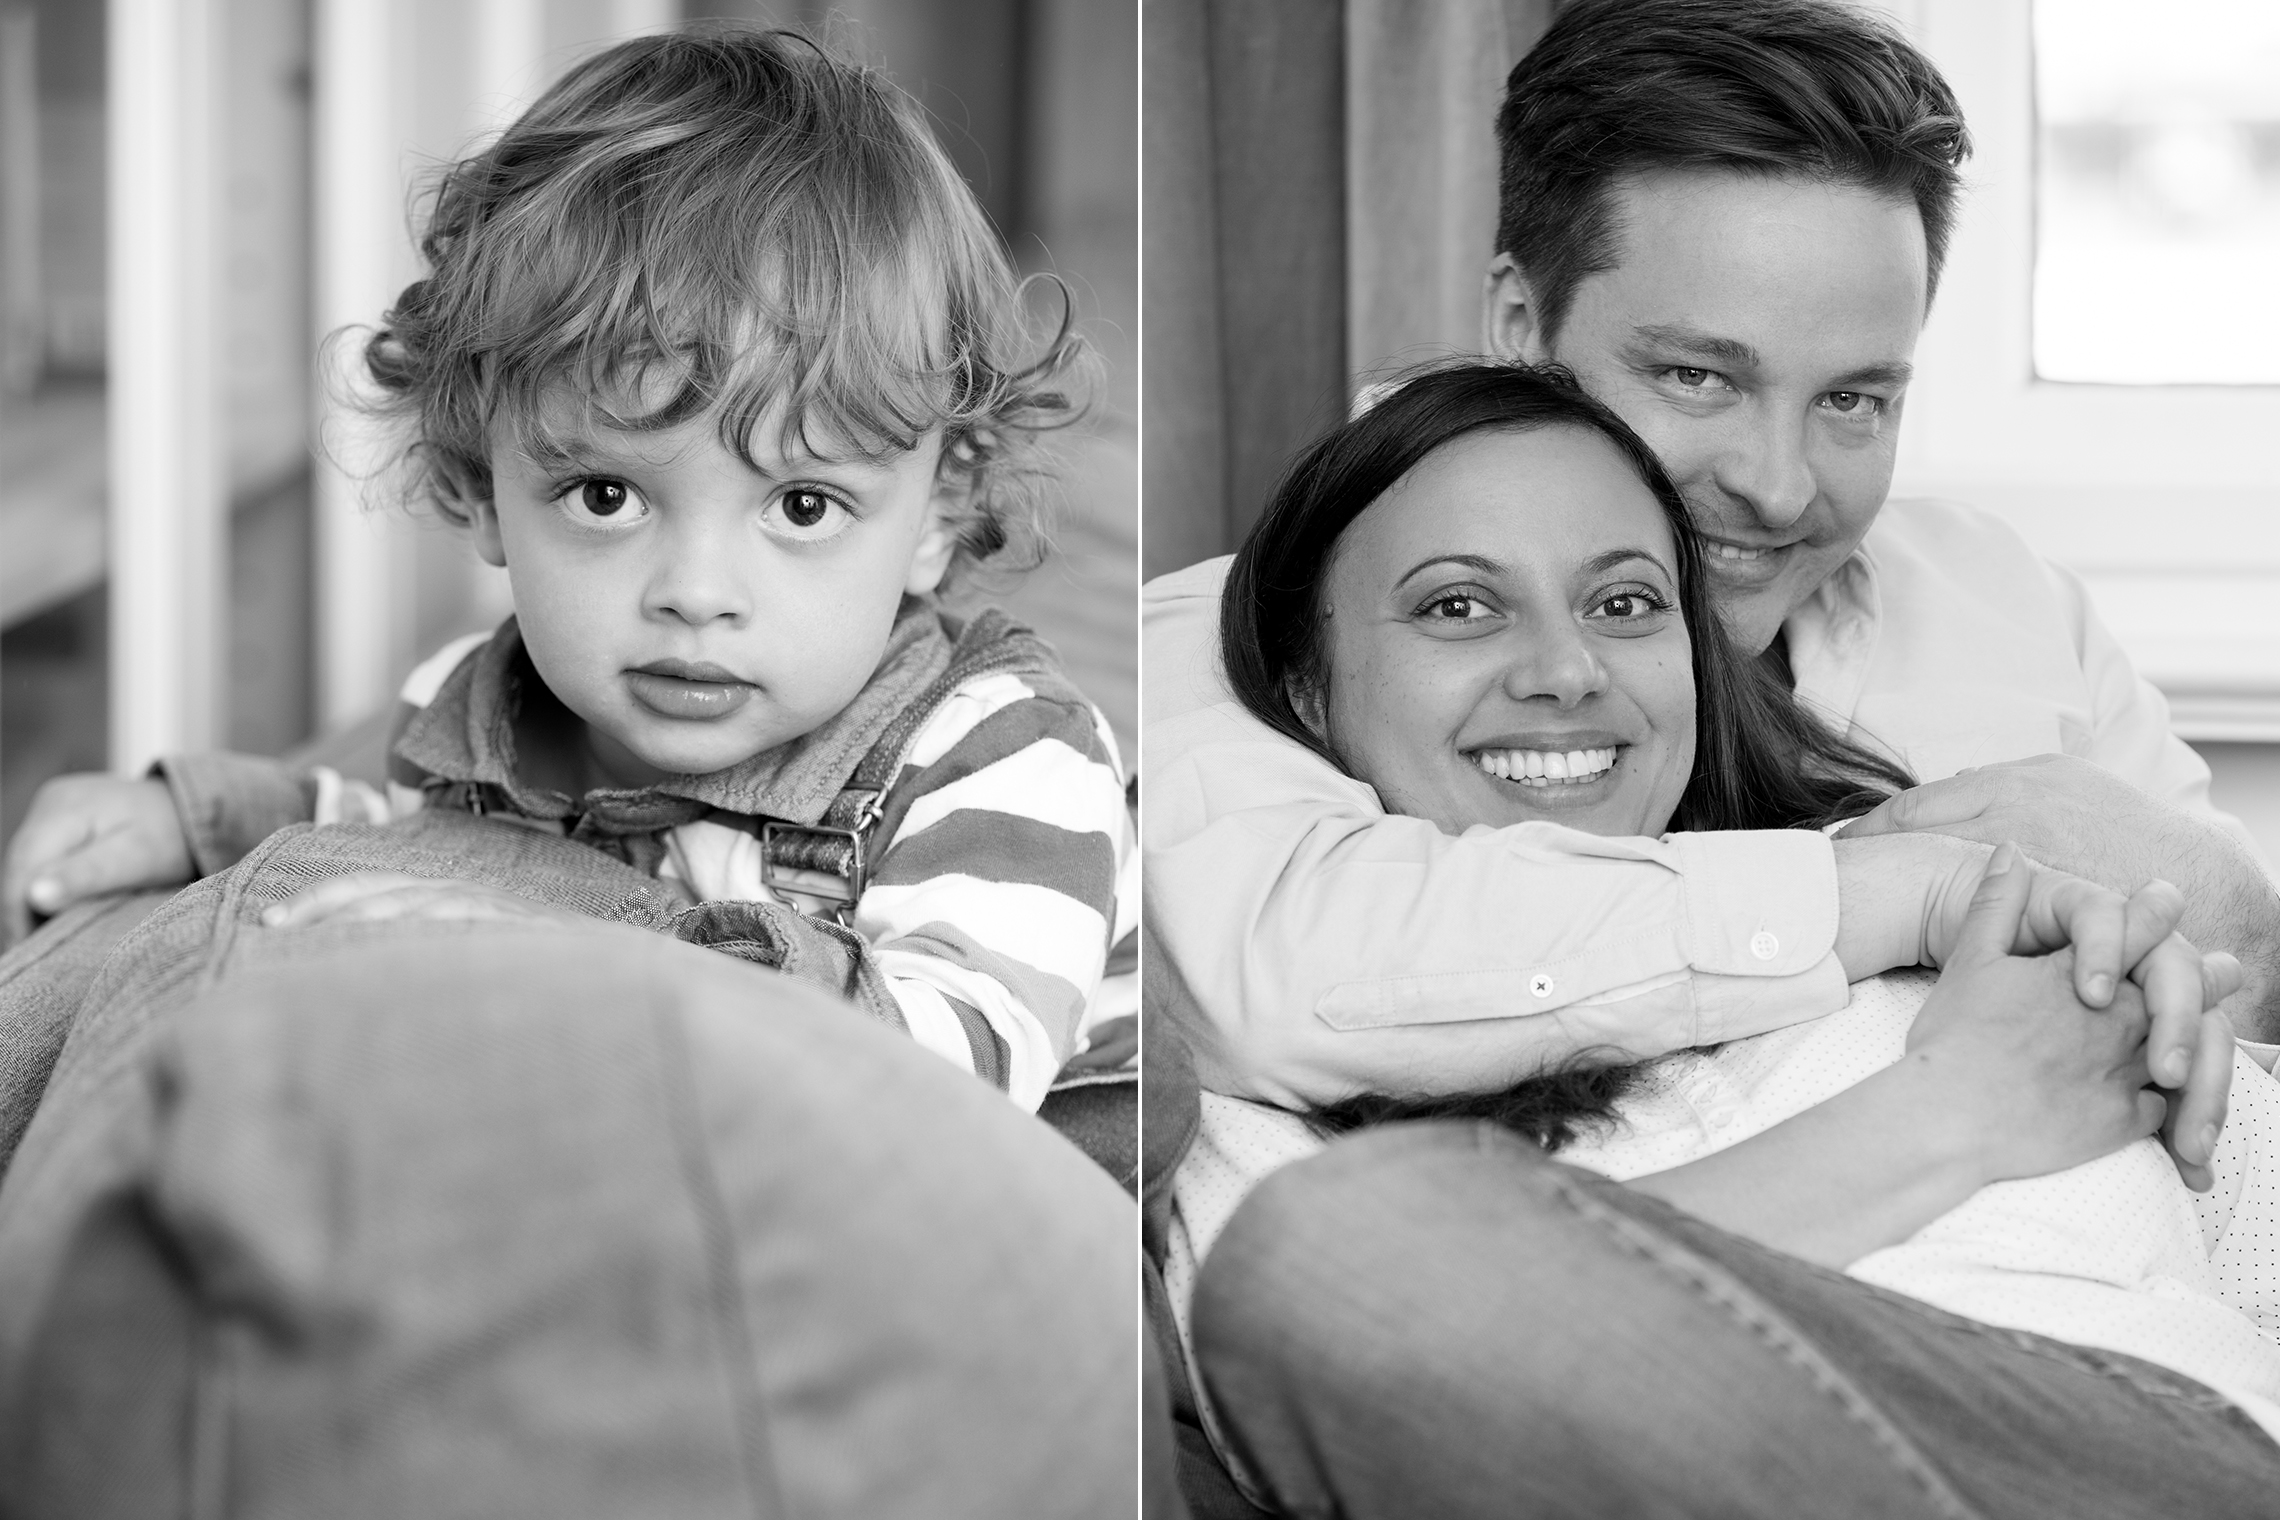 Portraitfotografie Familie schwarz-weiß Homestory Familienfotos Portraitfotografin Caro Hoene Photography Berlin